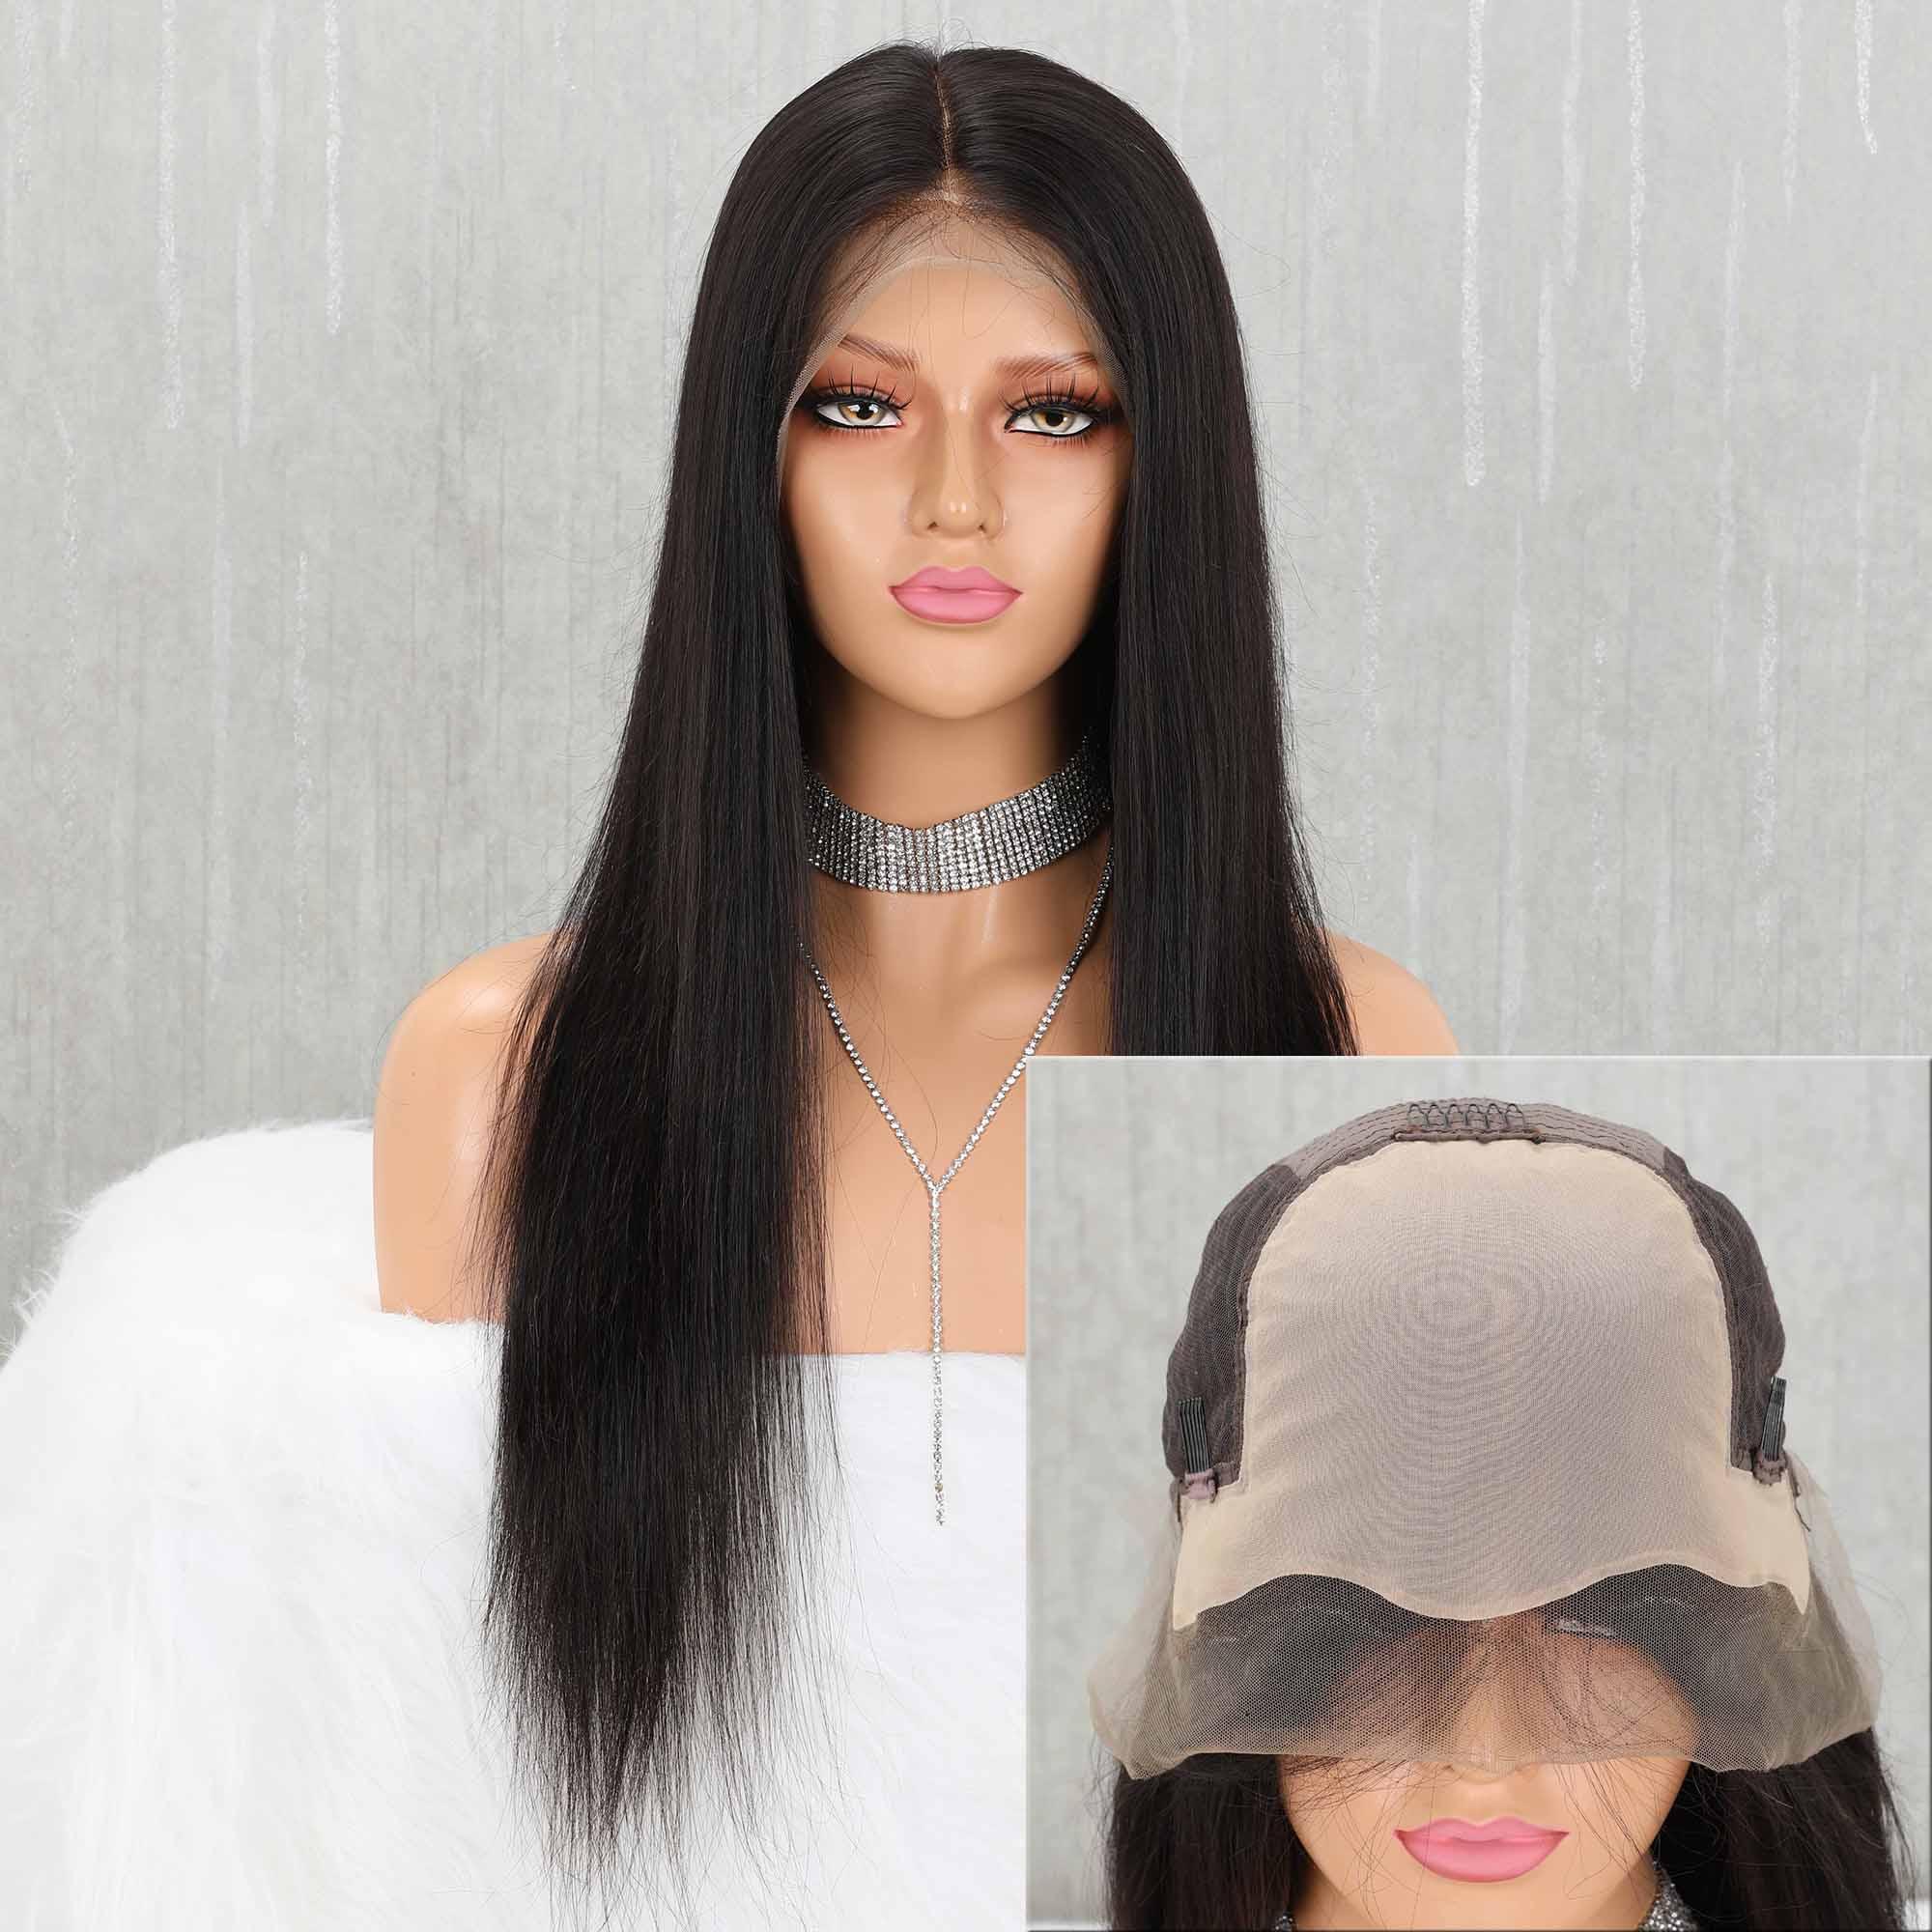 Yeahwigs 13*6 Straight Fake Scalp Wig 150% Silk Straight Wigs For Black Women